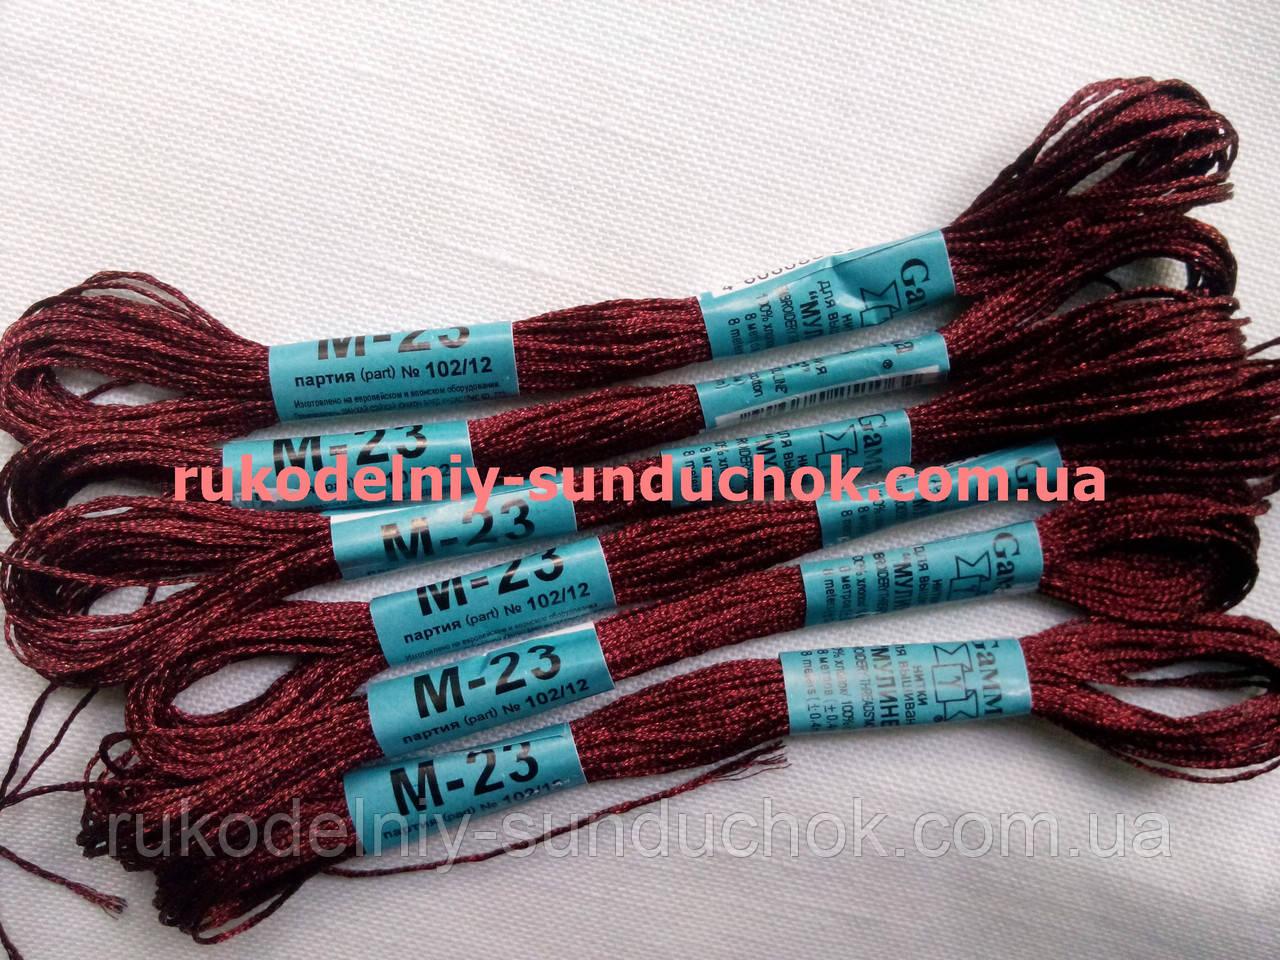 Мулине гамма металлик (Gamma) М-23